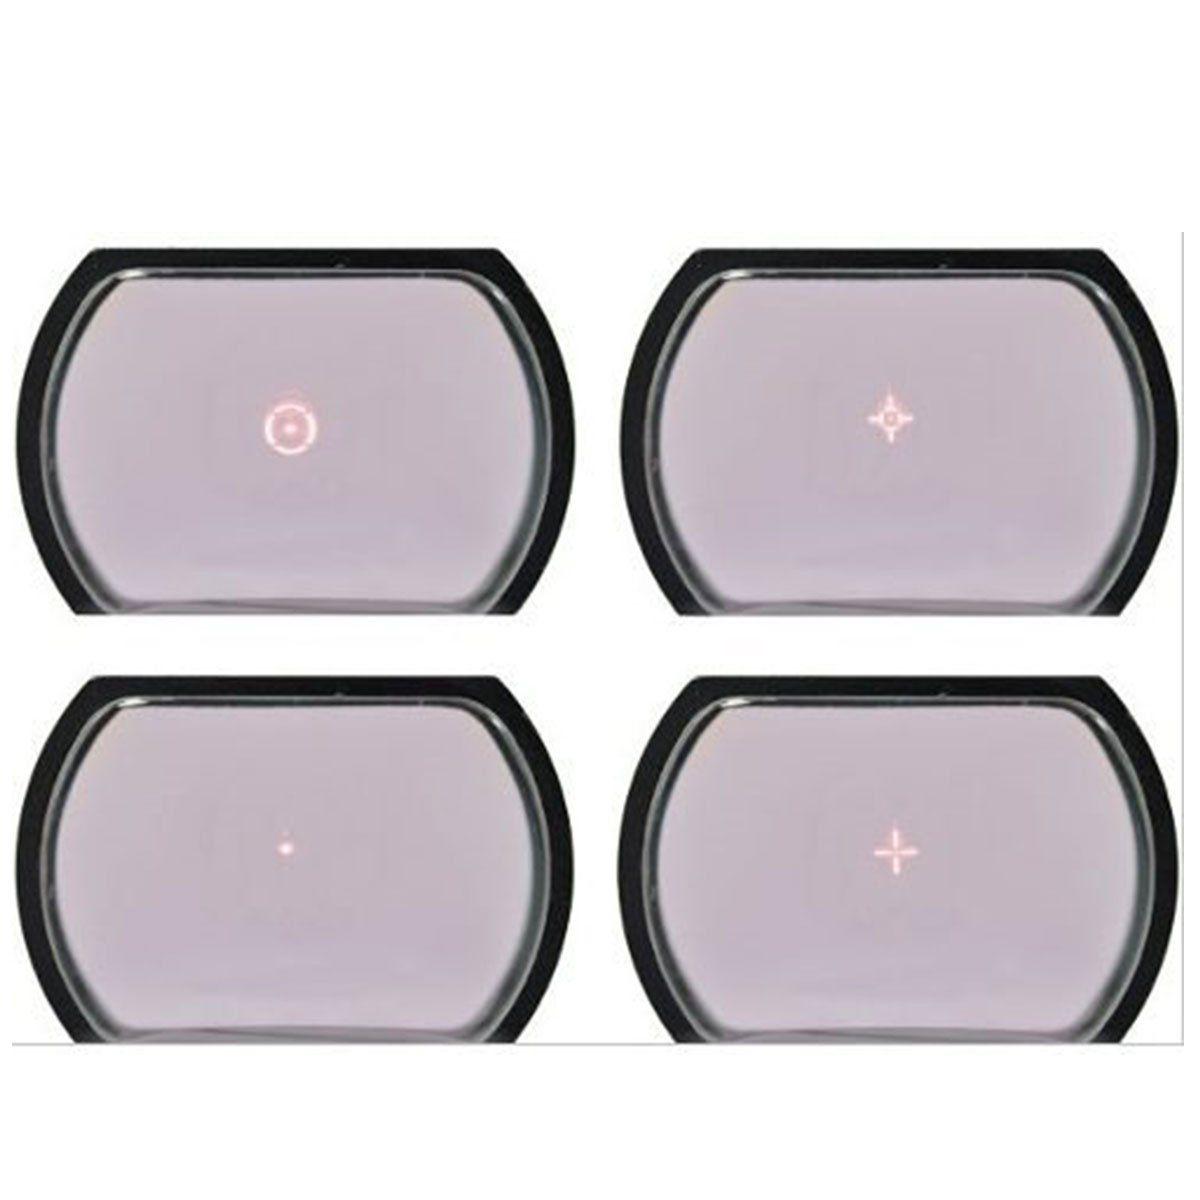 Mira Holografica Red Dot Rossi 1x22x33 Compacta Trilho 11mm